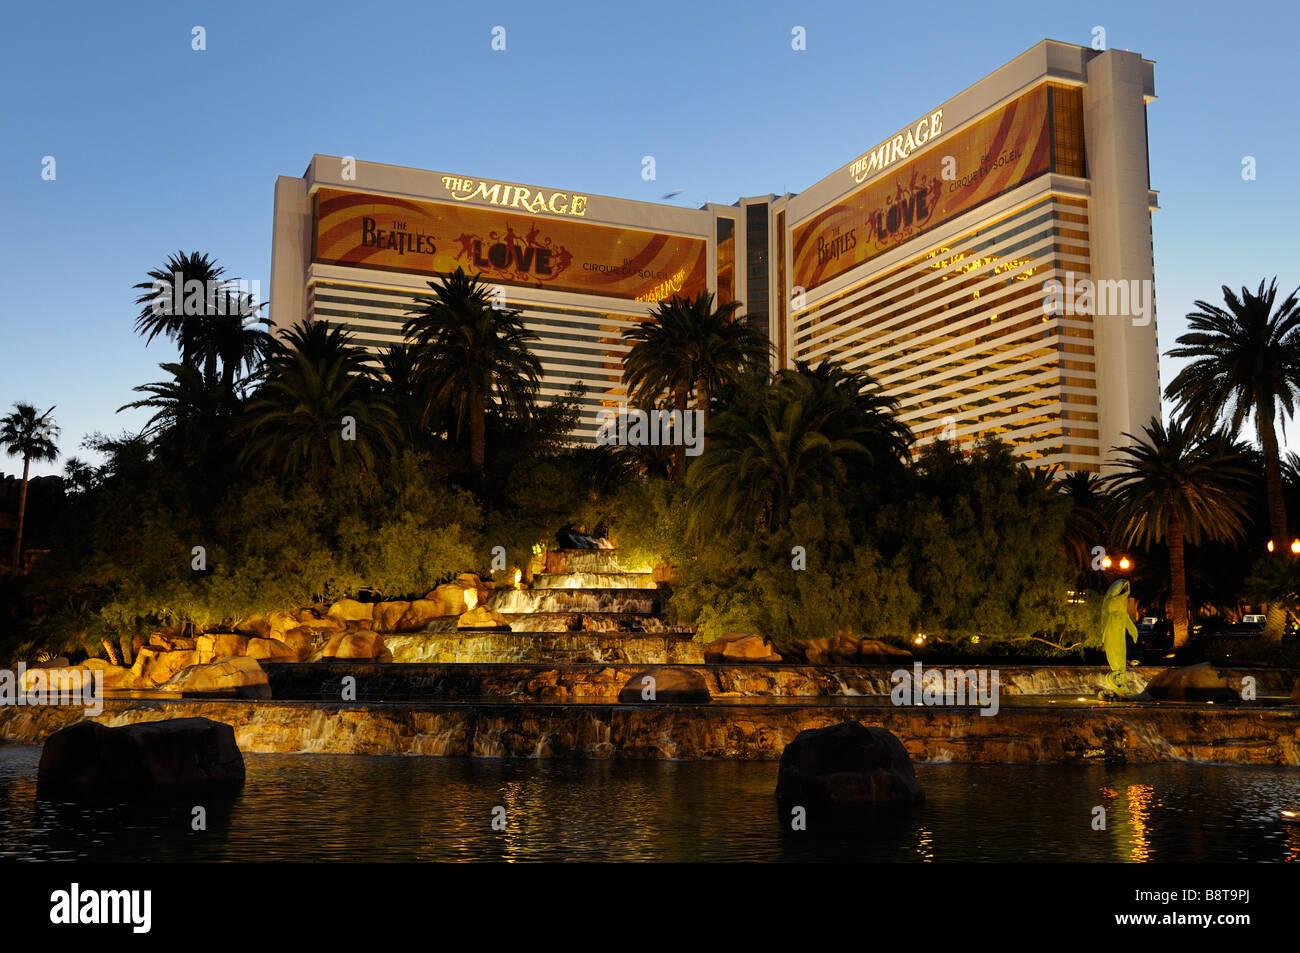 Dolphin Mirage Hotel Las Vegas Stock Photos & Dolphin Mirage Hotel ...